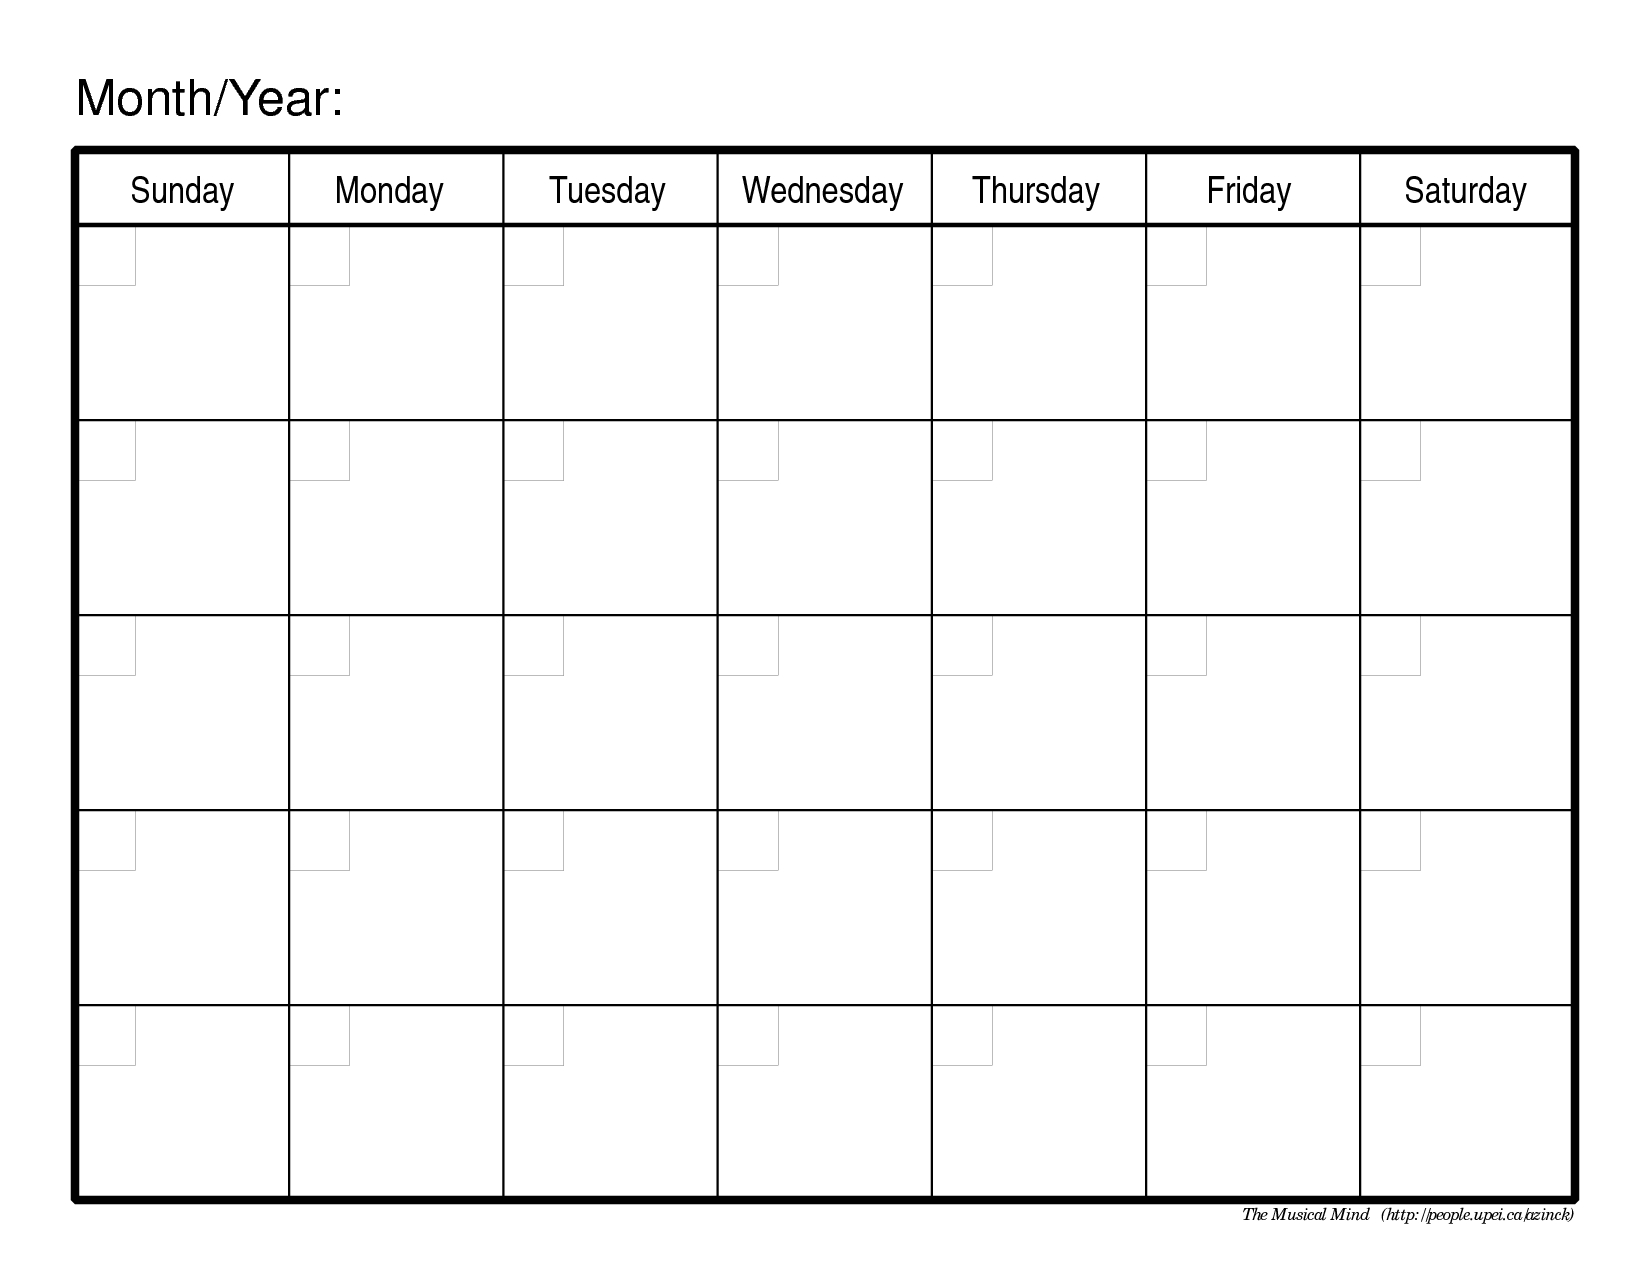 Monthly Calendar Template | Weekly Calendar Template Free